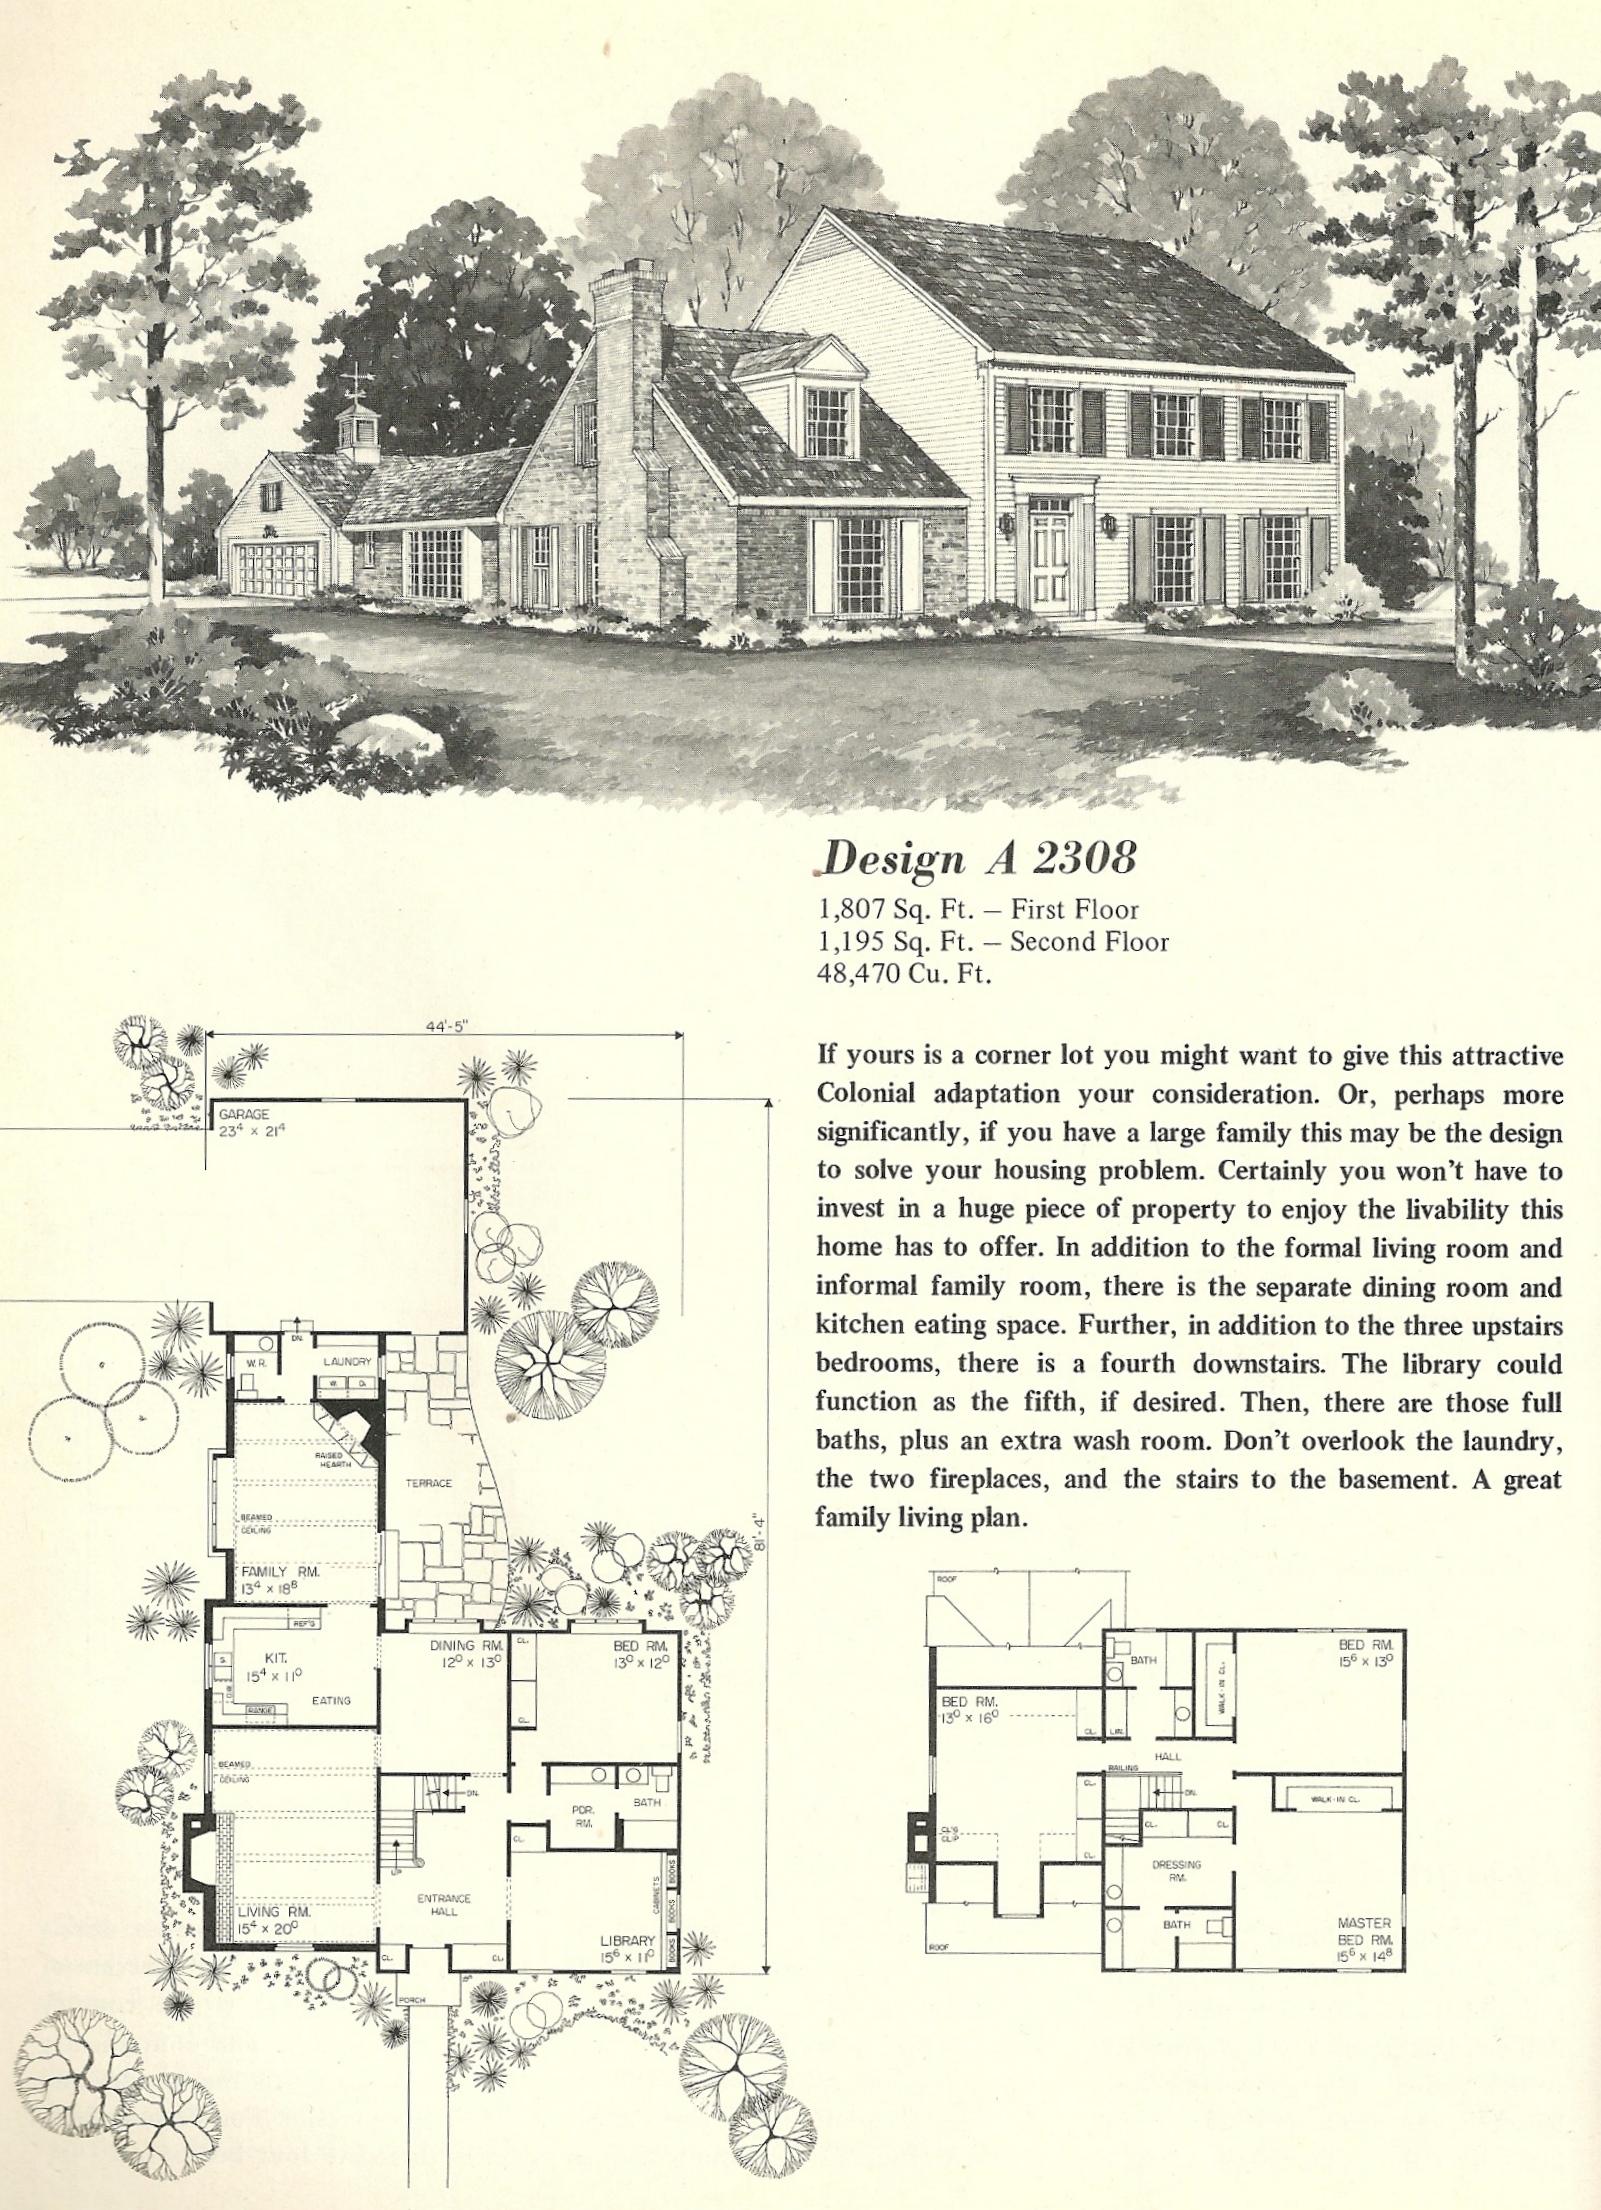 Vintage house plans 2308 antique alter ego for Antique colonial house plans